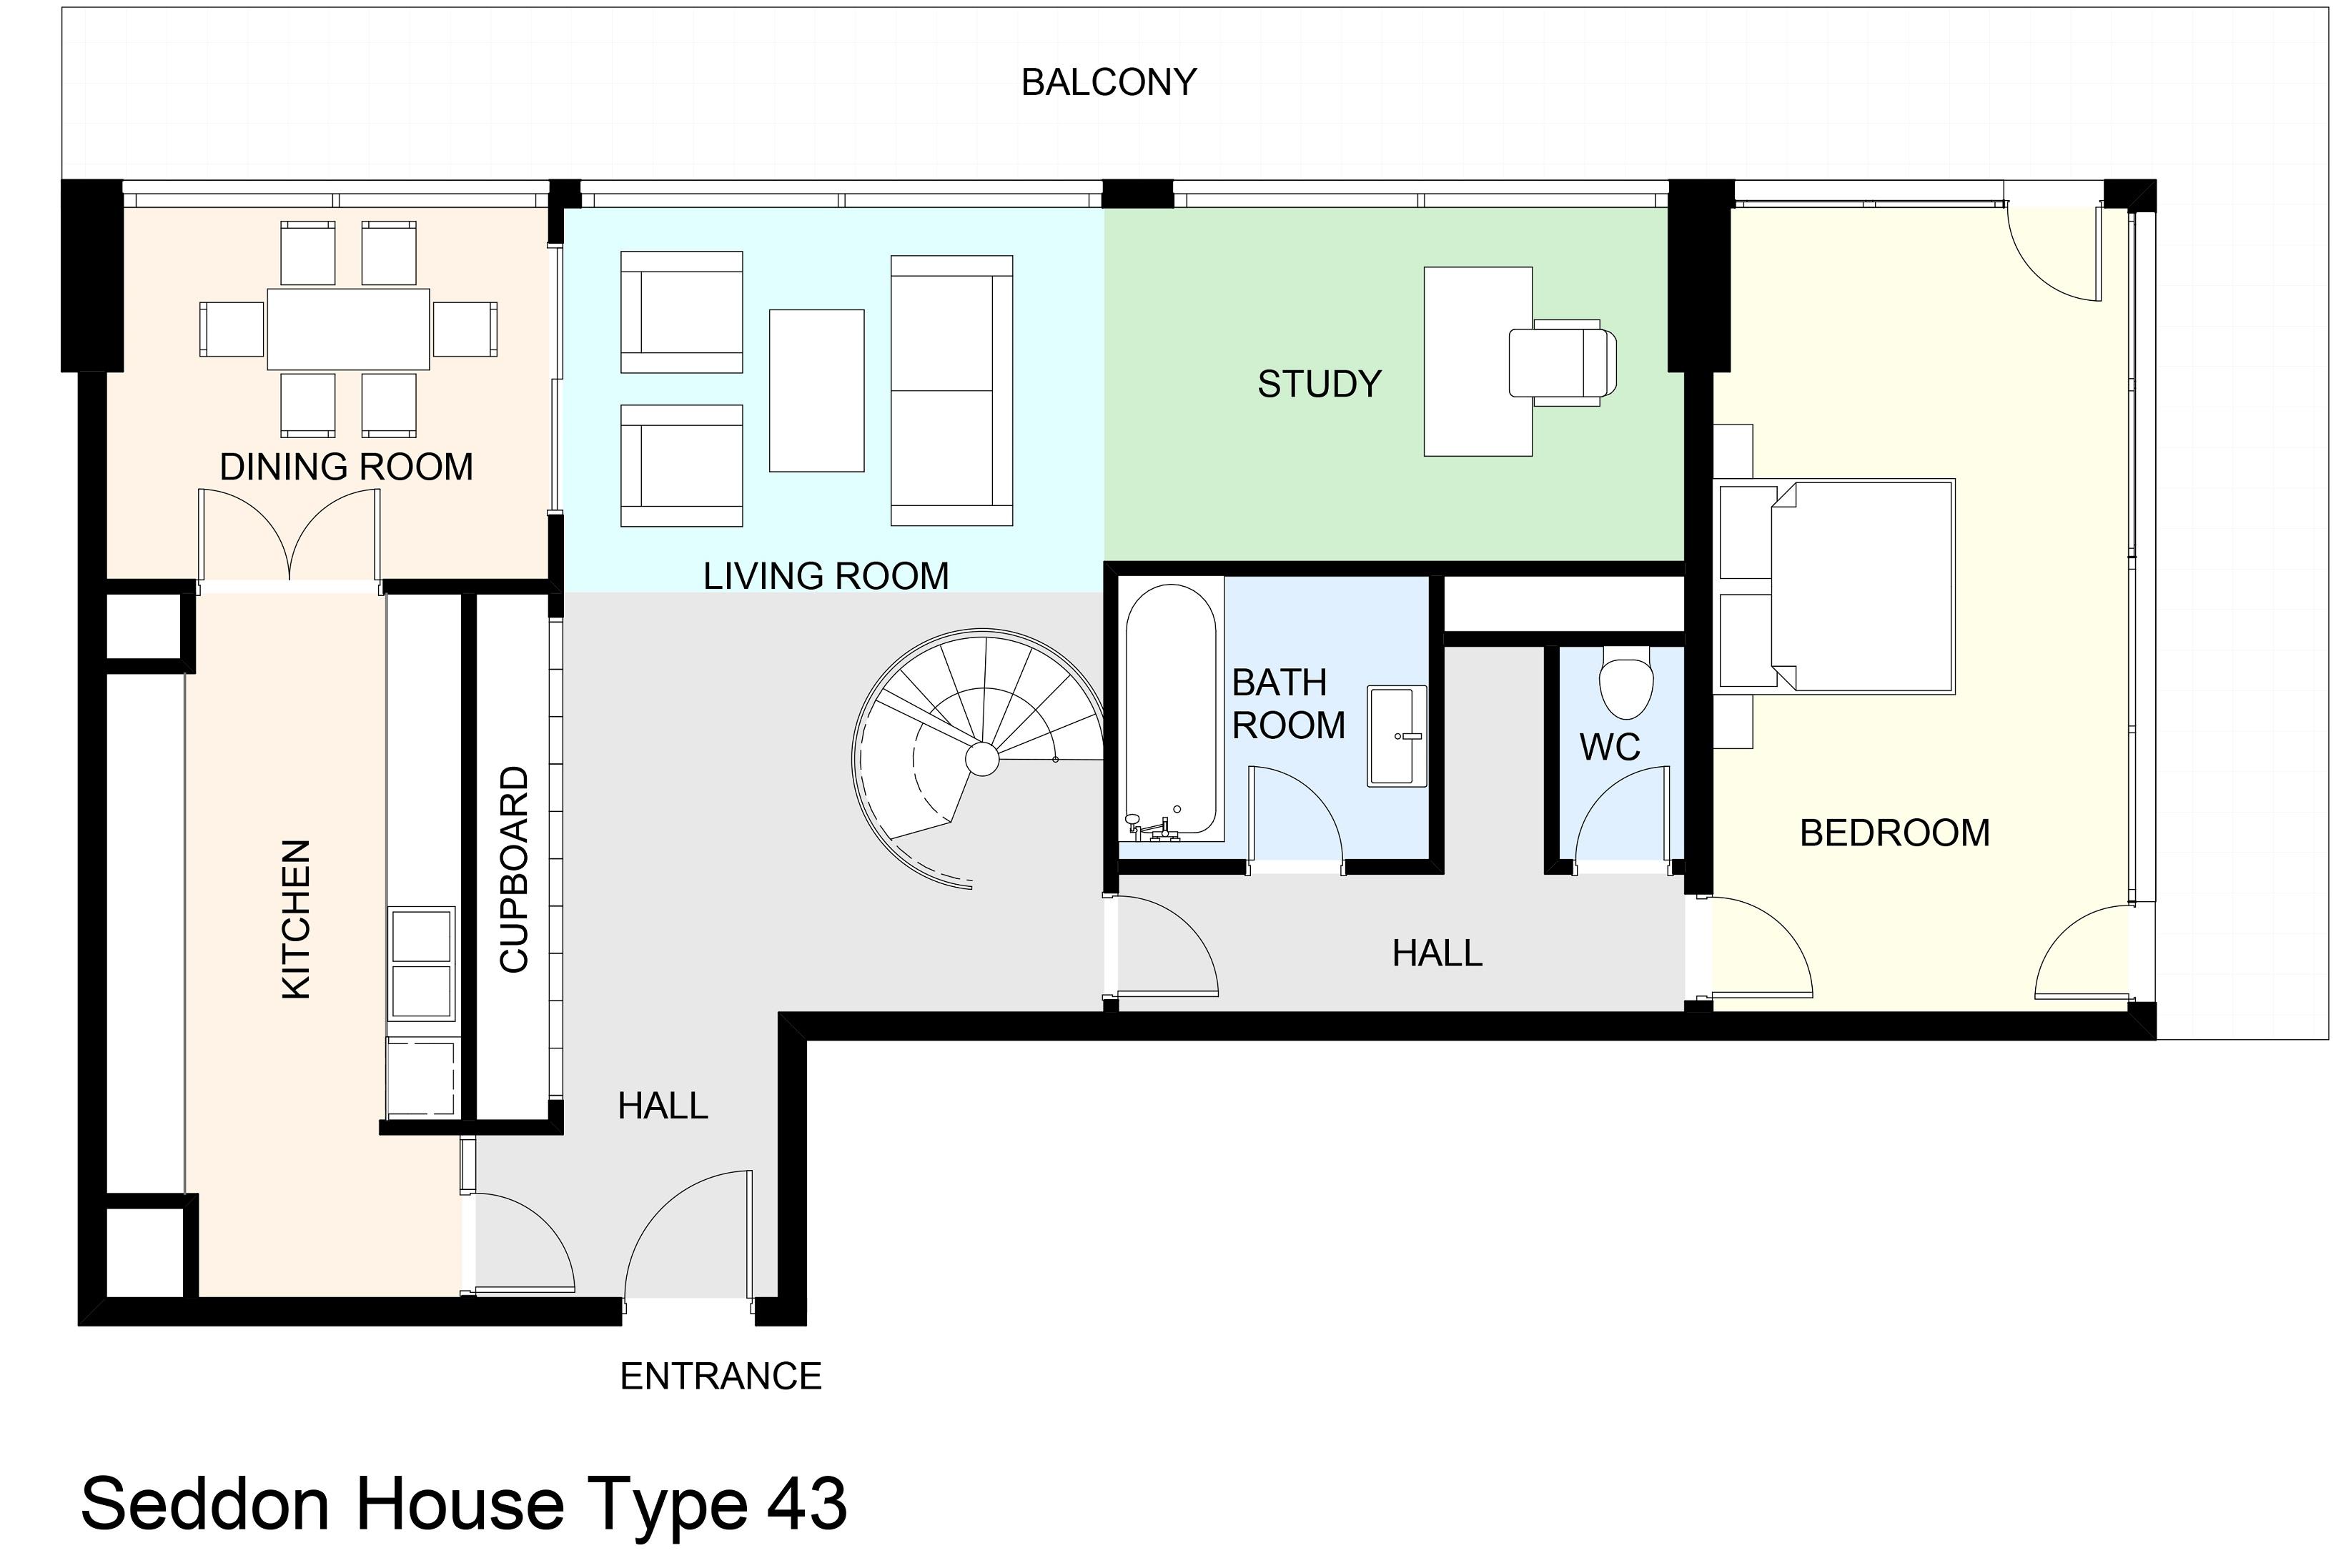 Seddon House Type 43